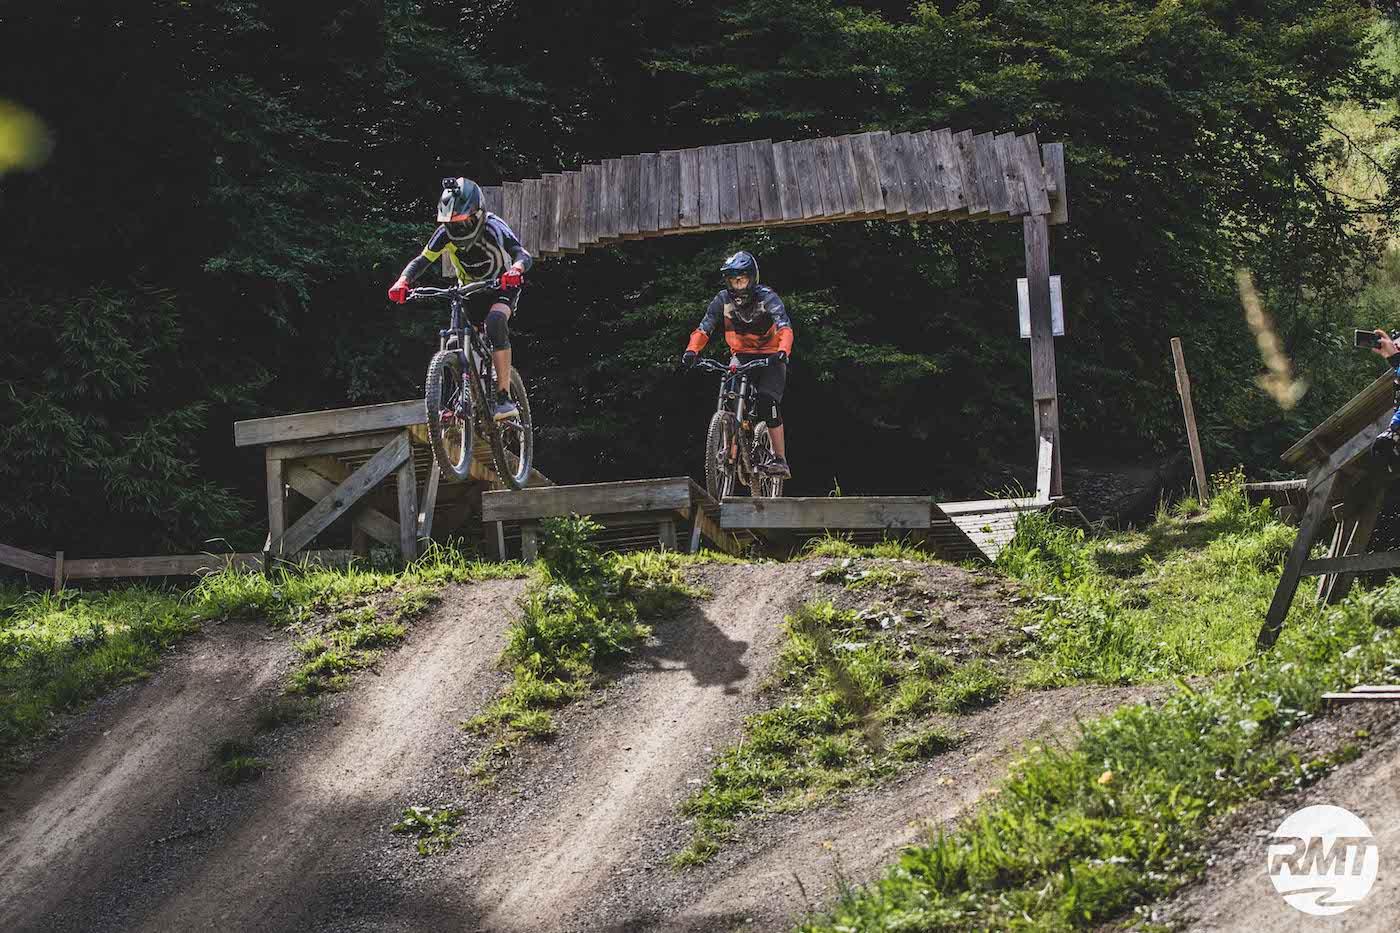 Bikepark Winterberg Kinder Kurs Fahrtechnik Basic Training 8-12 Jahre - Rock my Trail Bikeschule 10